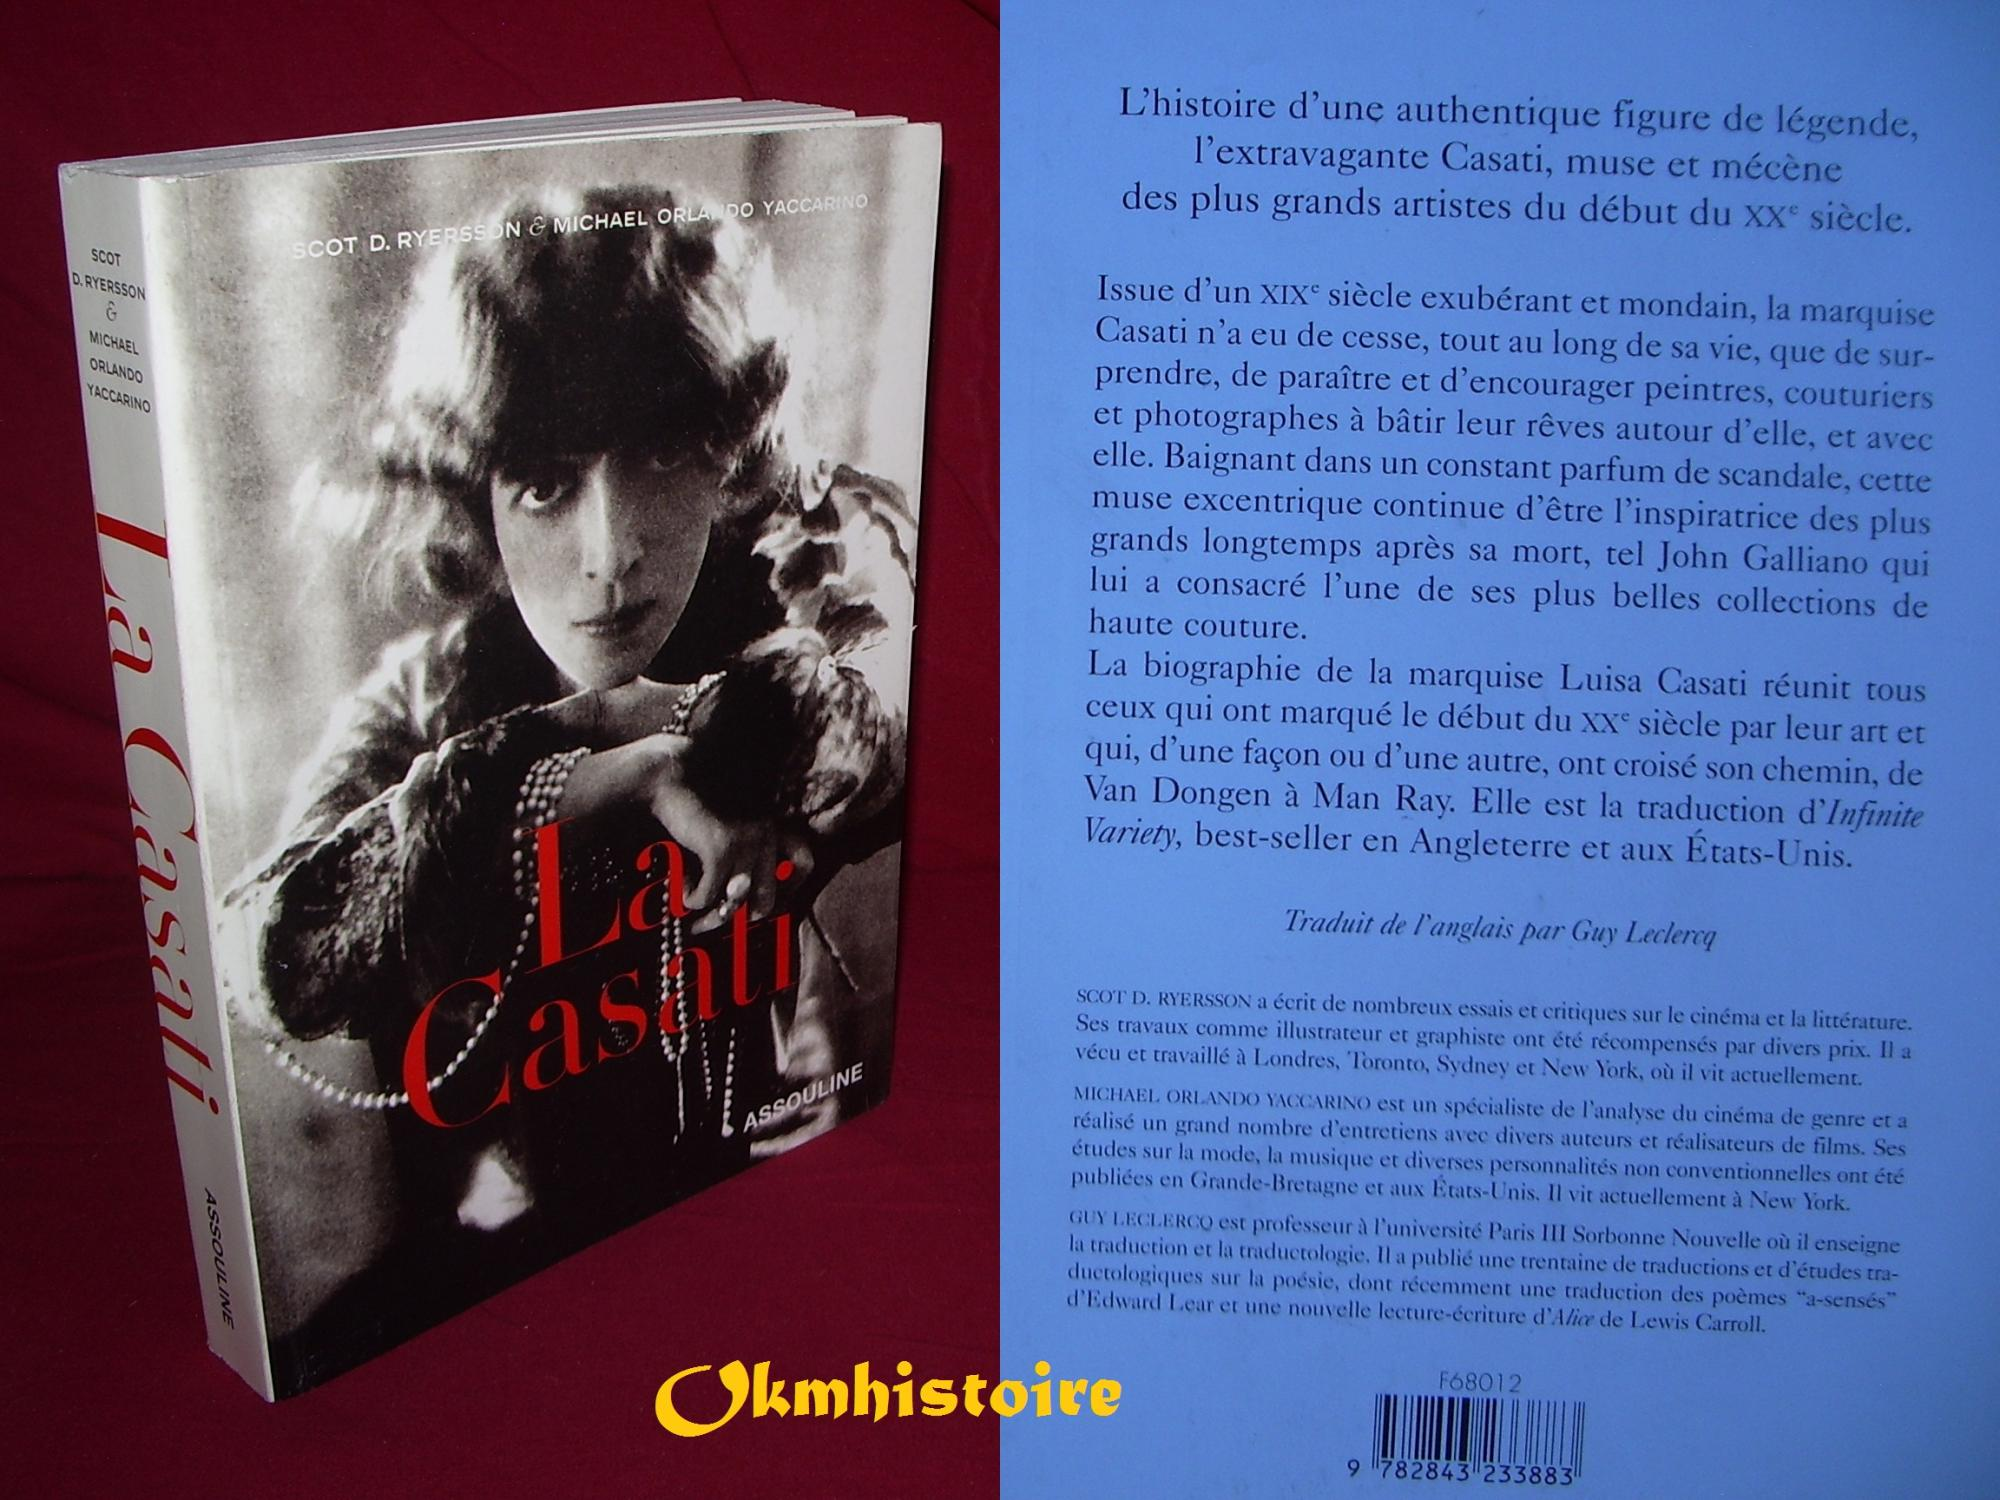 LA CASATI : Les Multiples vies de la Marquise Luisa Casati: Scot D. Ryersson & Michael Orlando ...